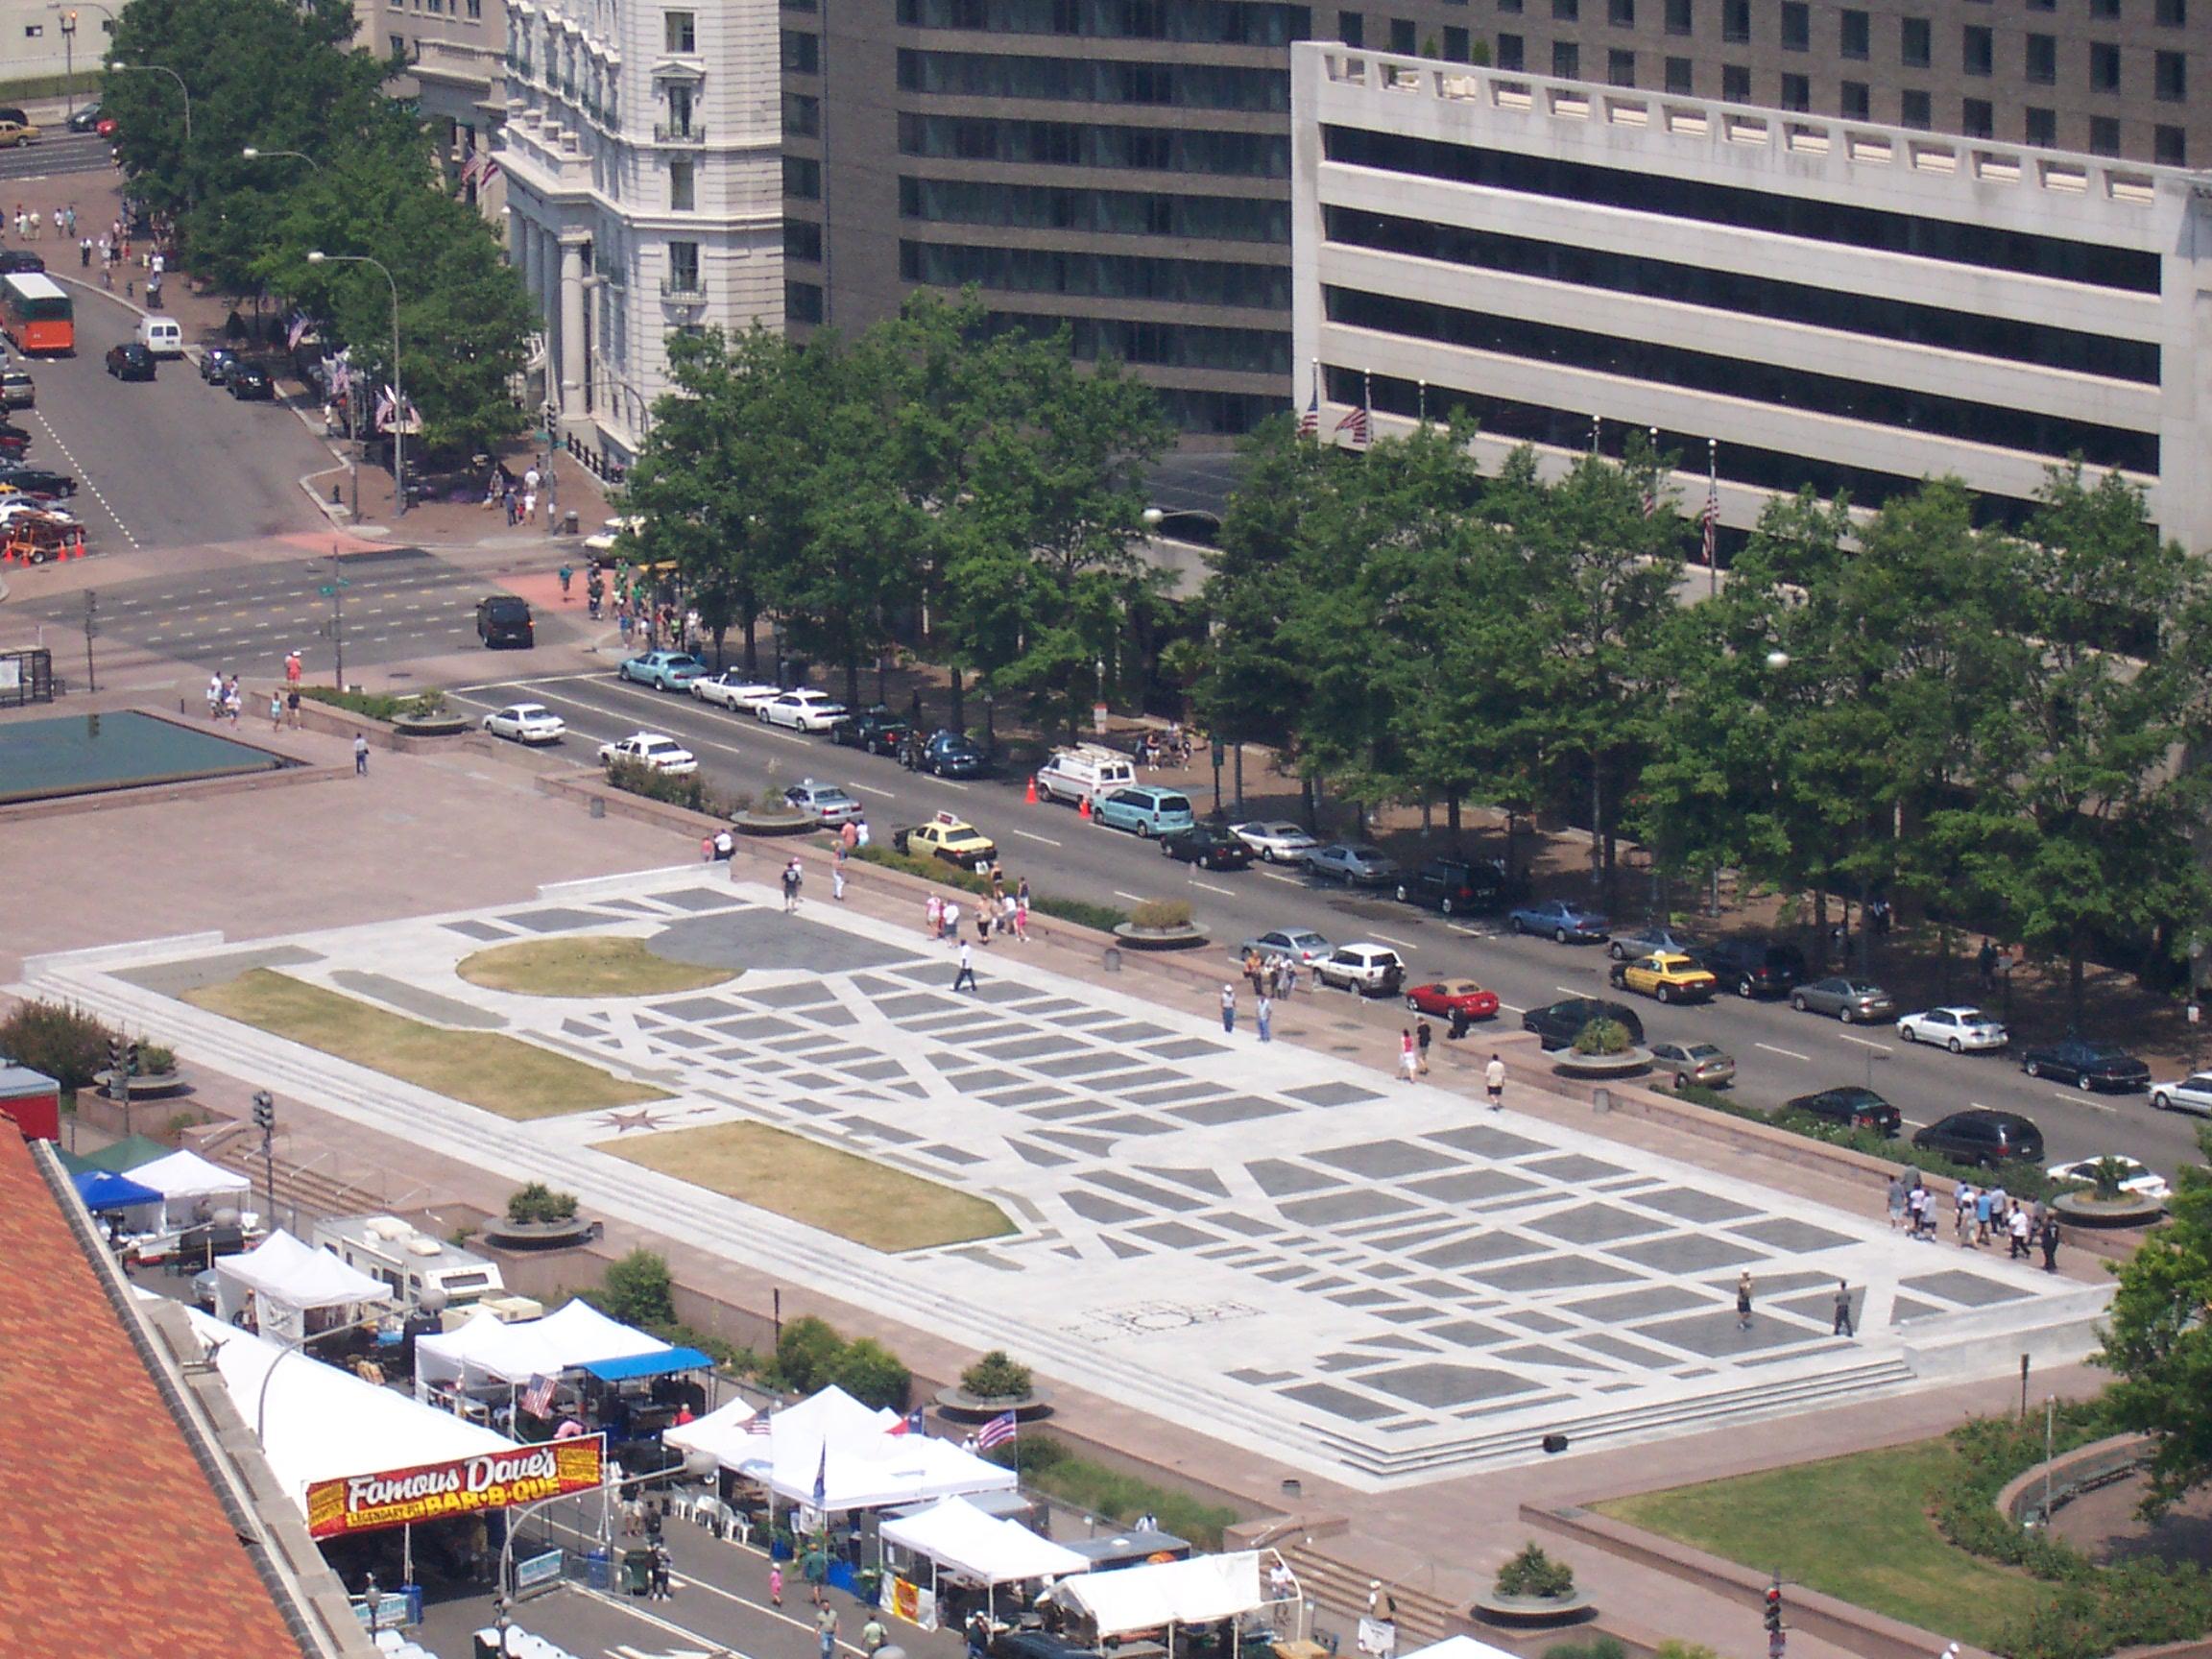 FileFederal Plaza Washington DCjpg Wikimedia Commons - Washington dc map layout